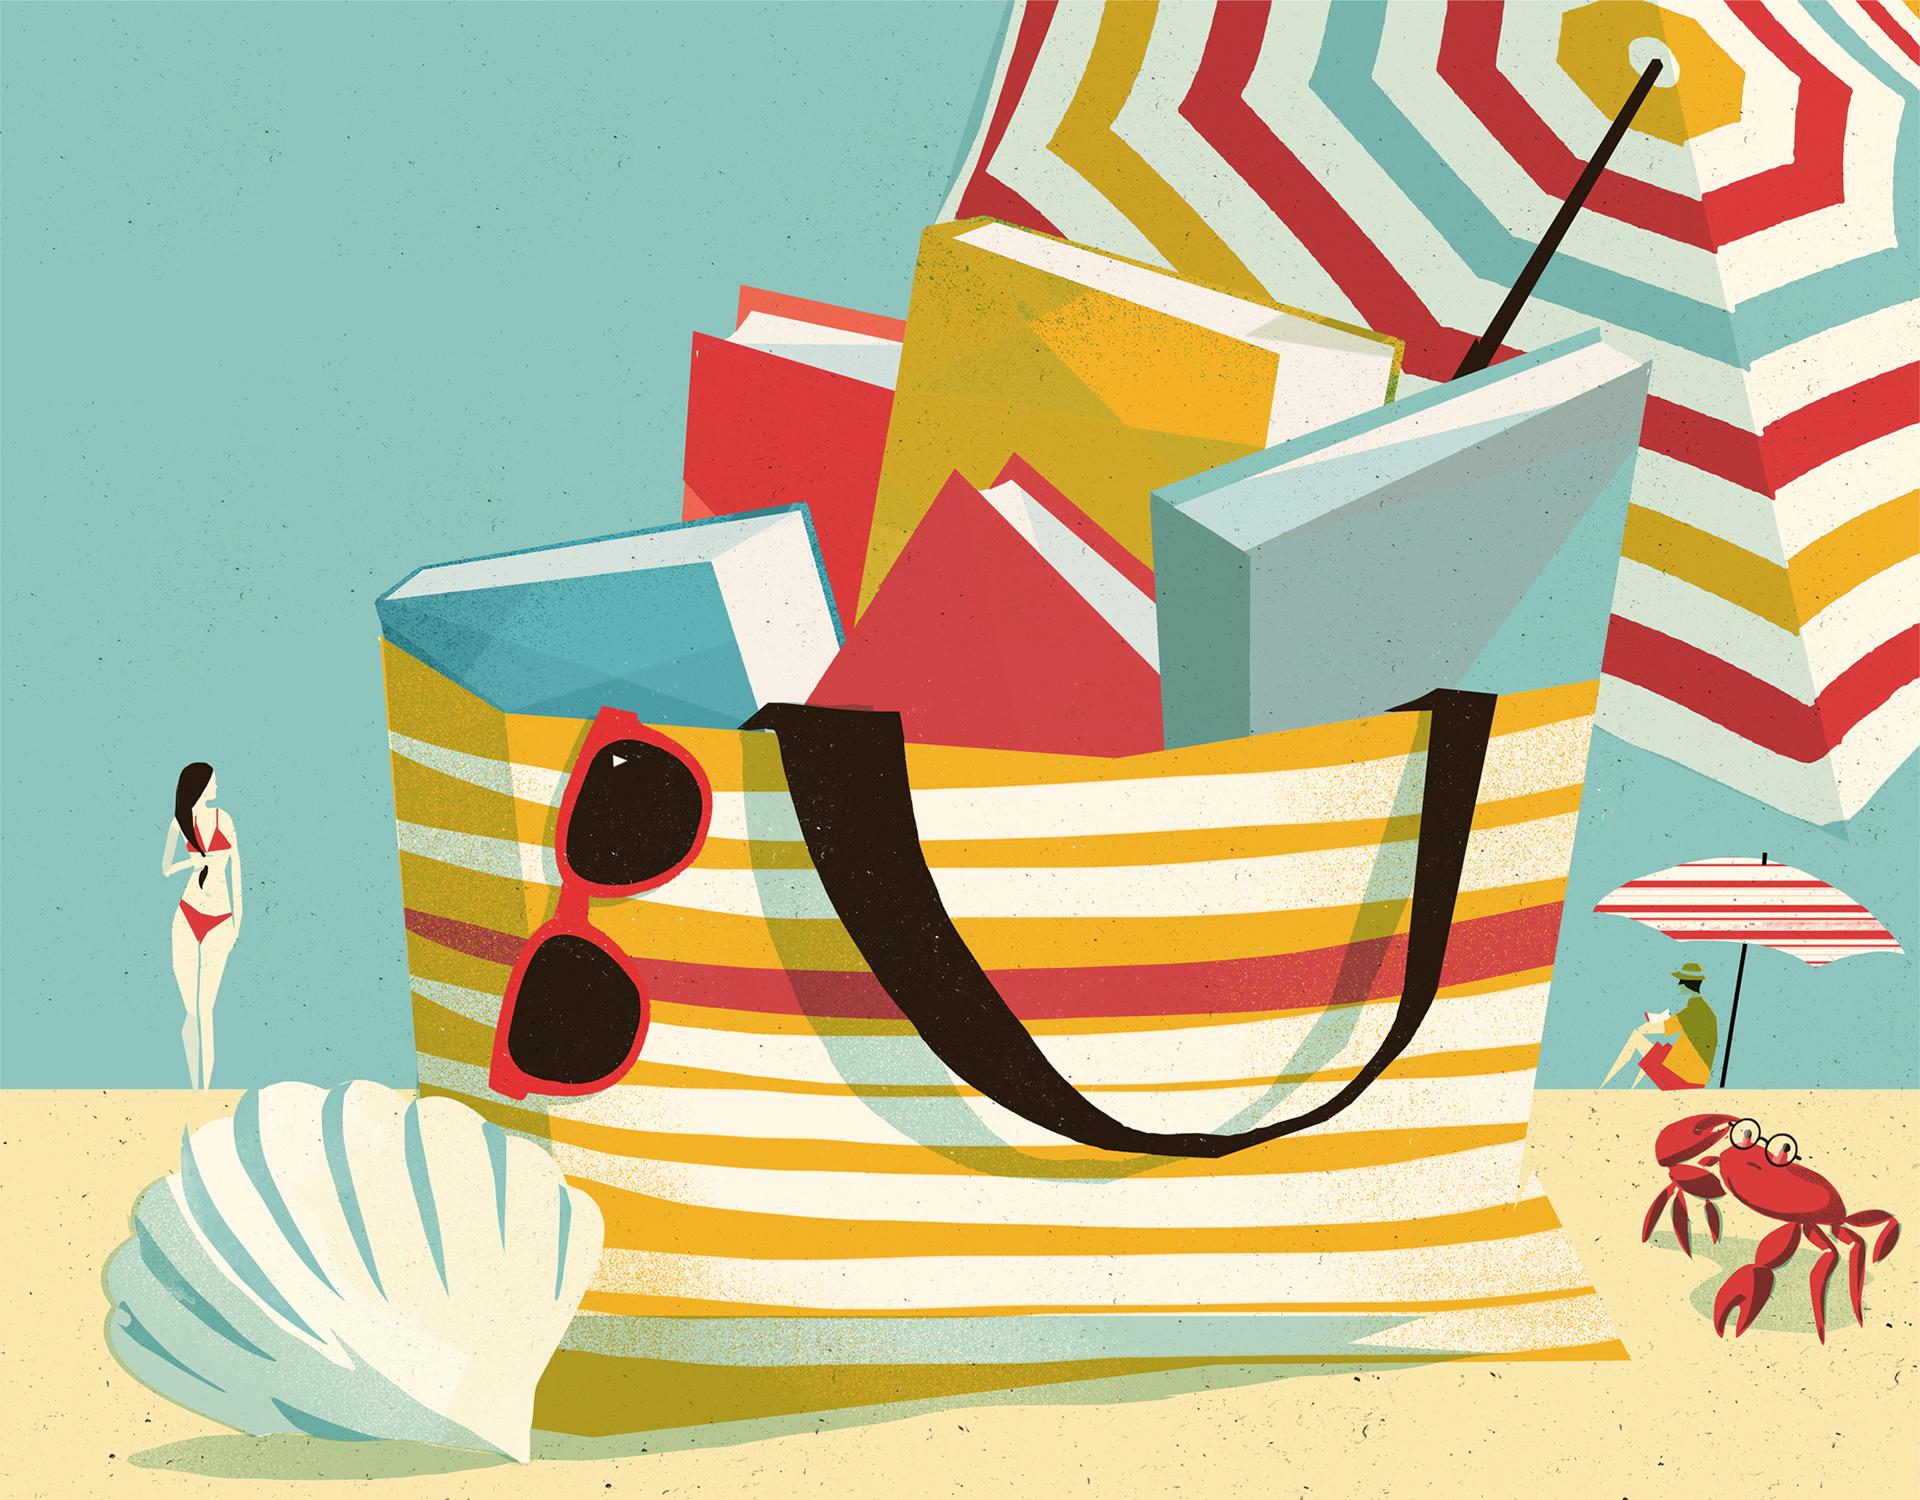 Digital Painting Elegant screenprint glasses beach bag parasol woman man crab book books stripe stripes sand shellfish shell